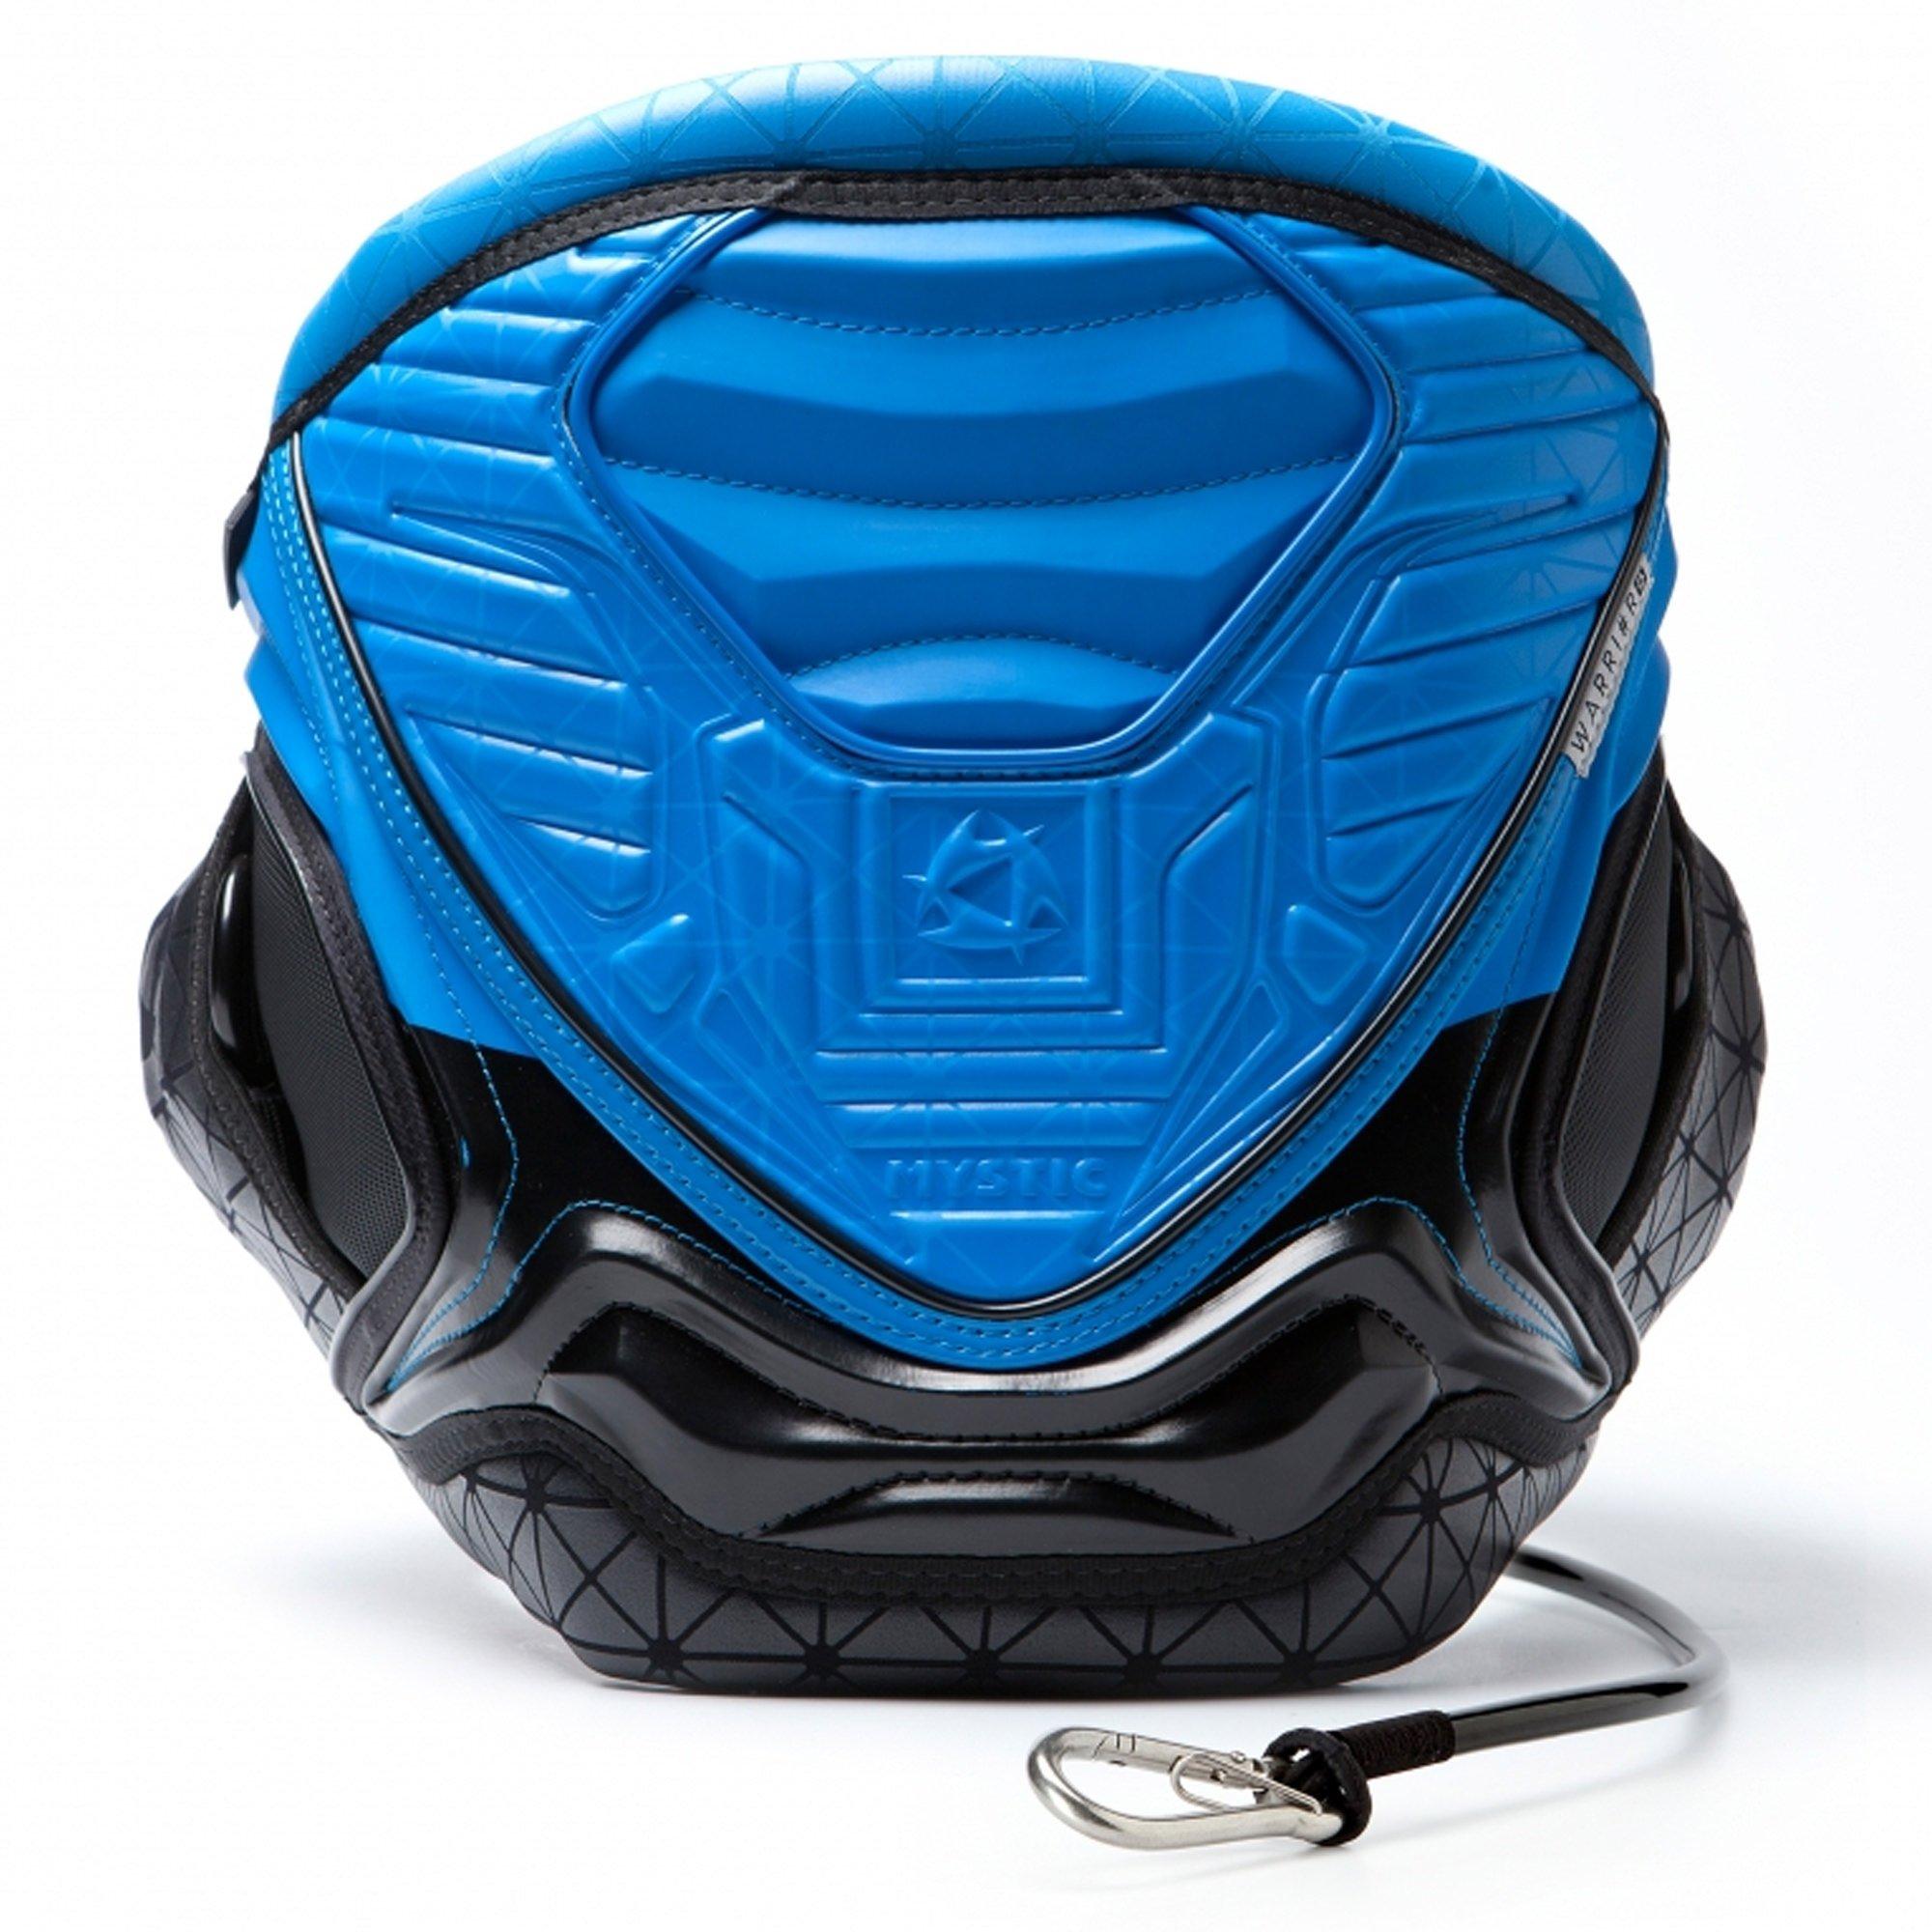 Mystic Warrior Multi-Use Kite Waist Harness Blue 150595 Sizes- - Small